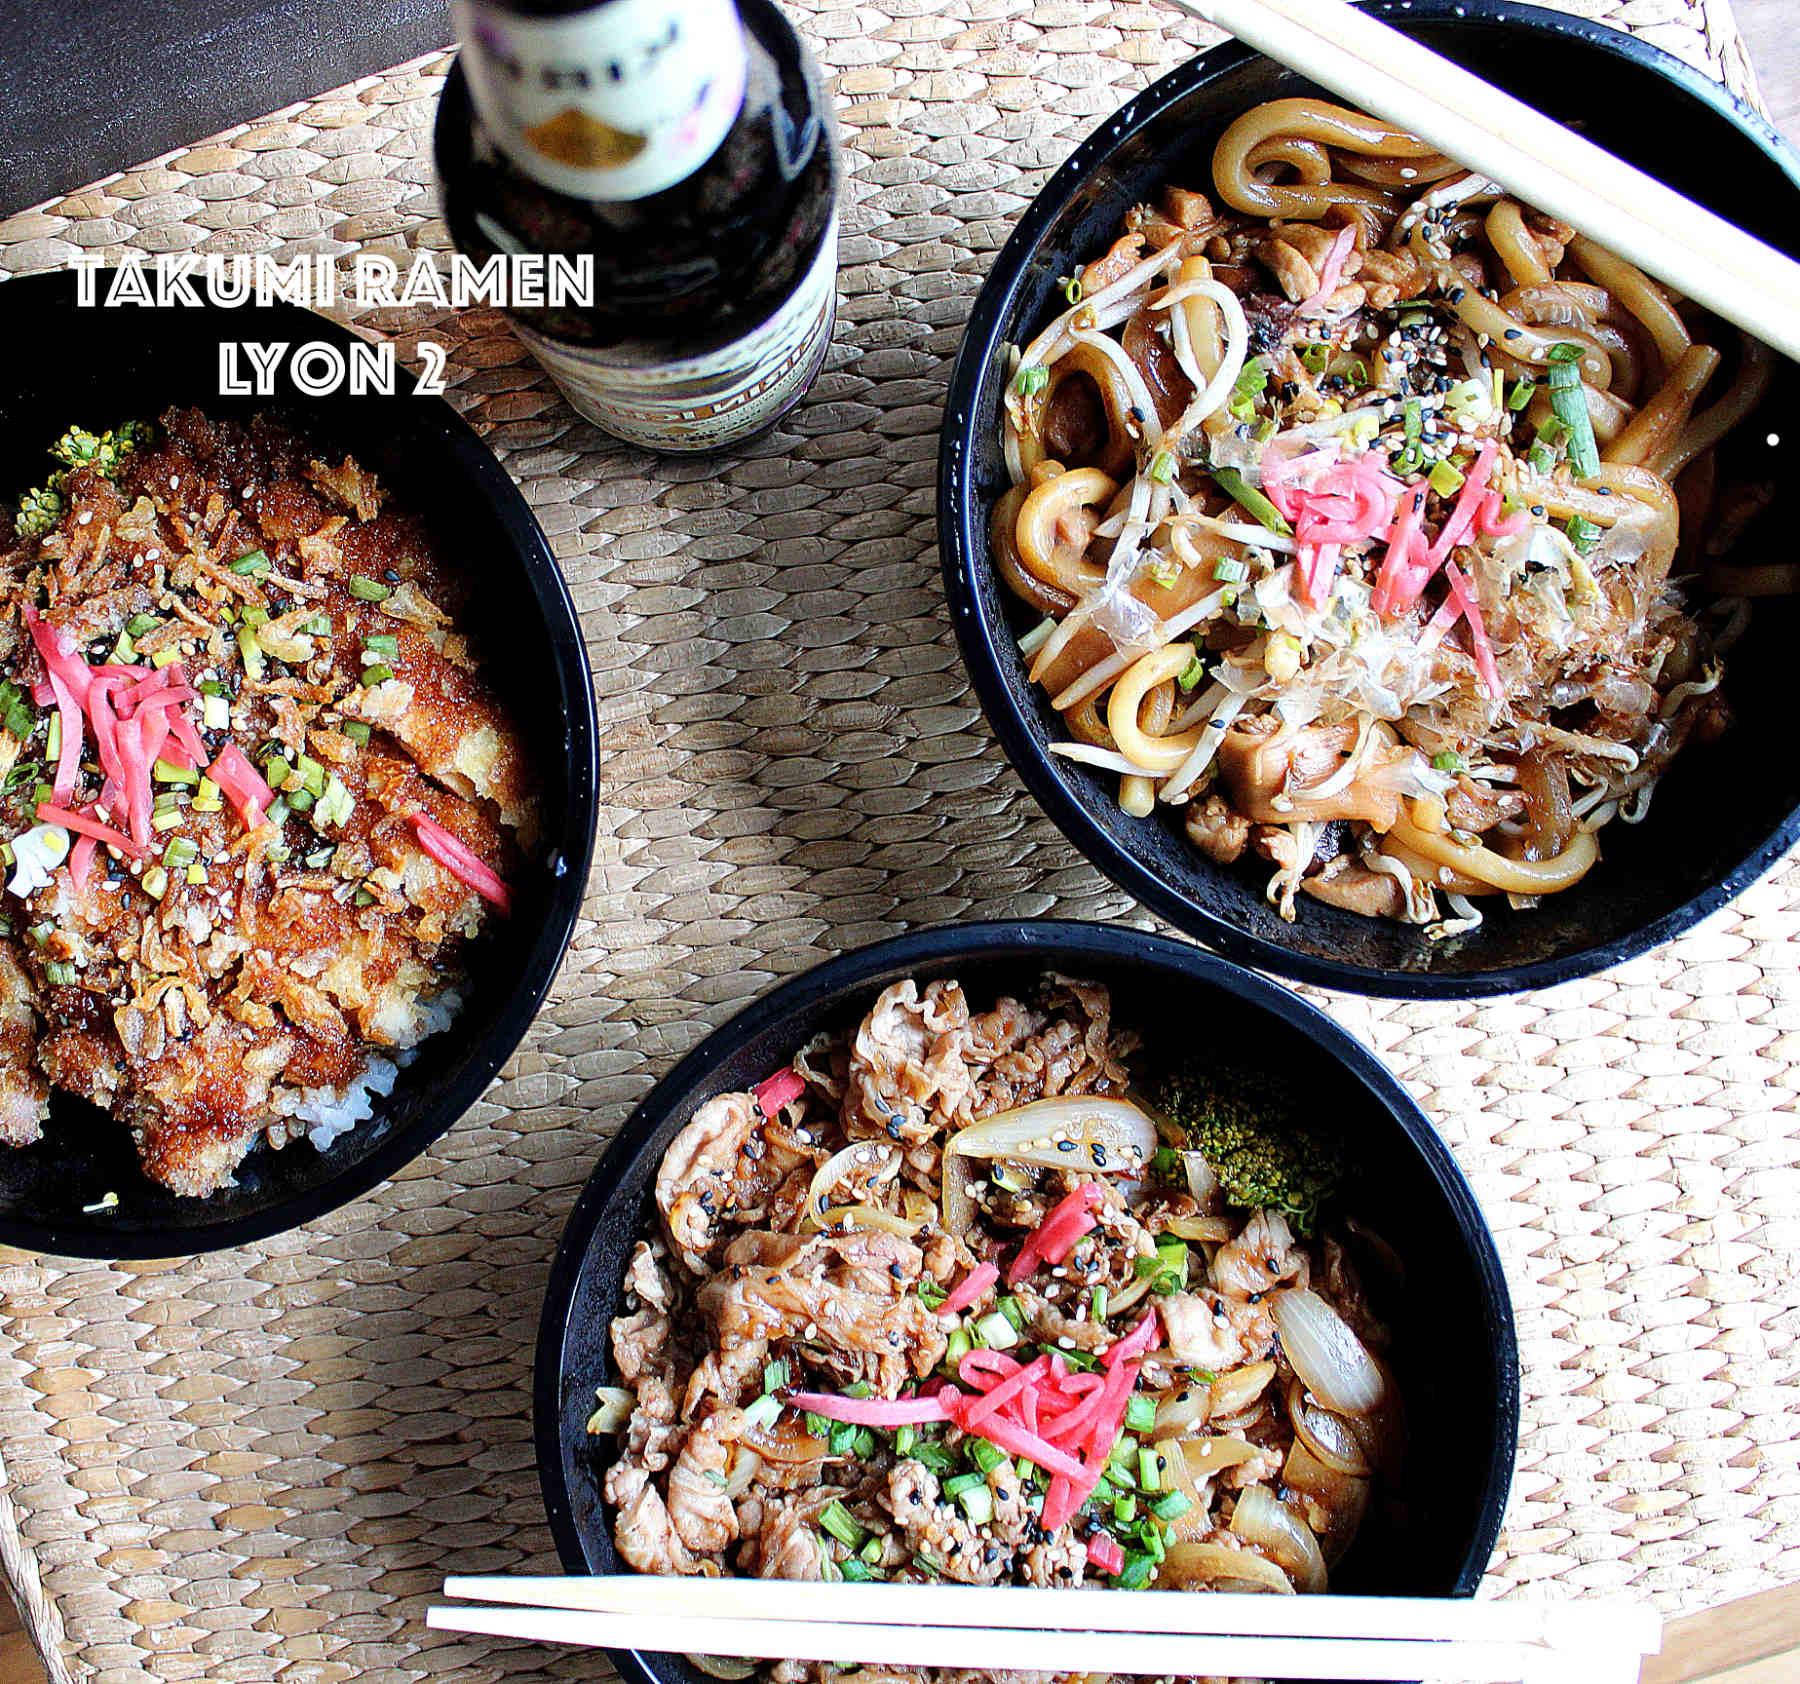 Takumi Ramen, a delicious japanese restaurant (Lyon 2)